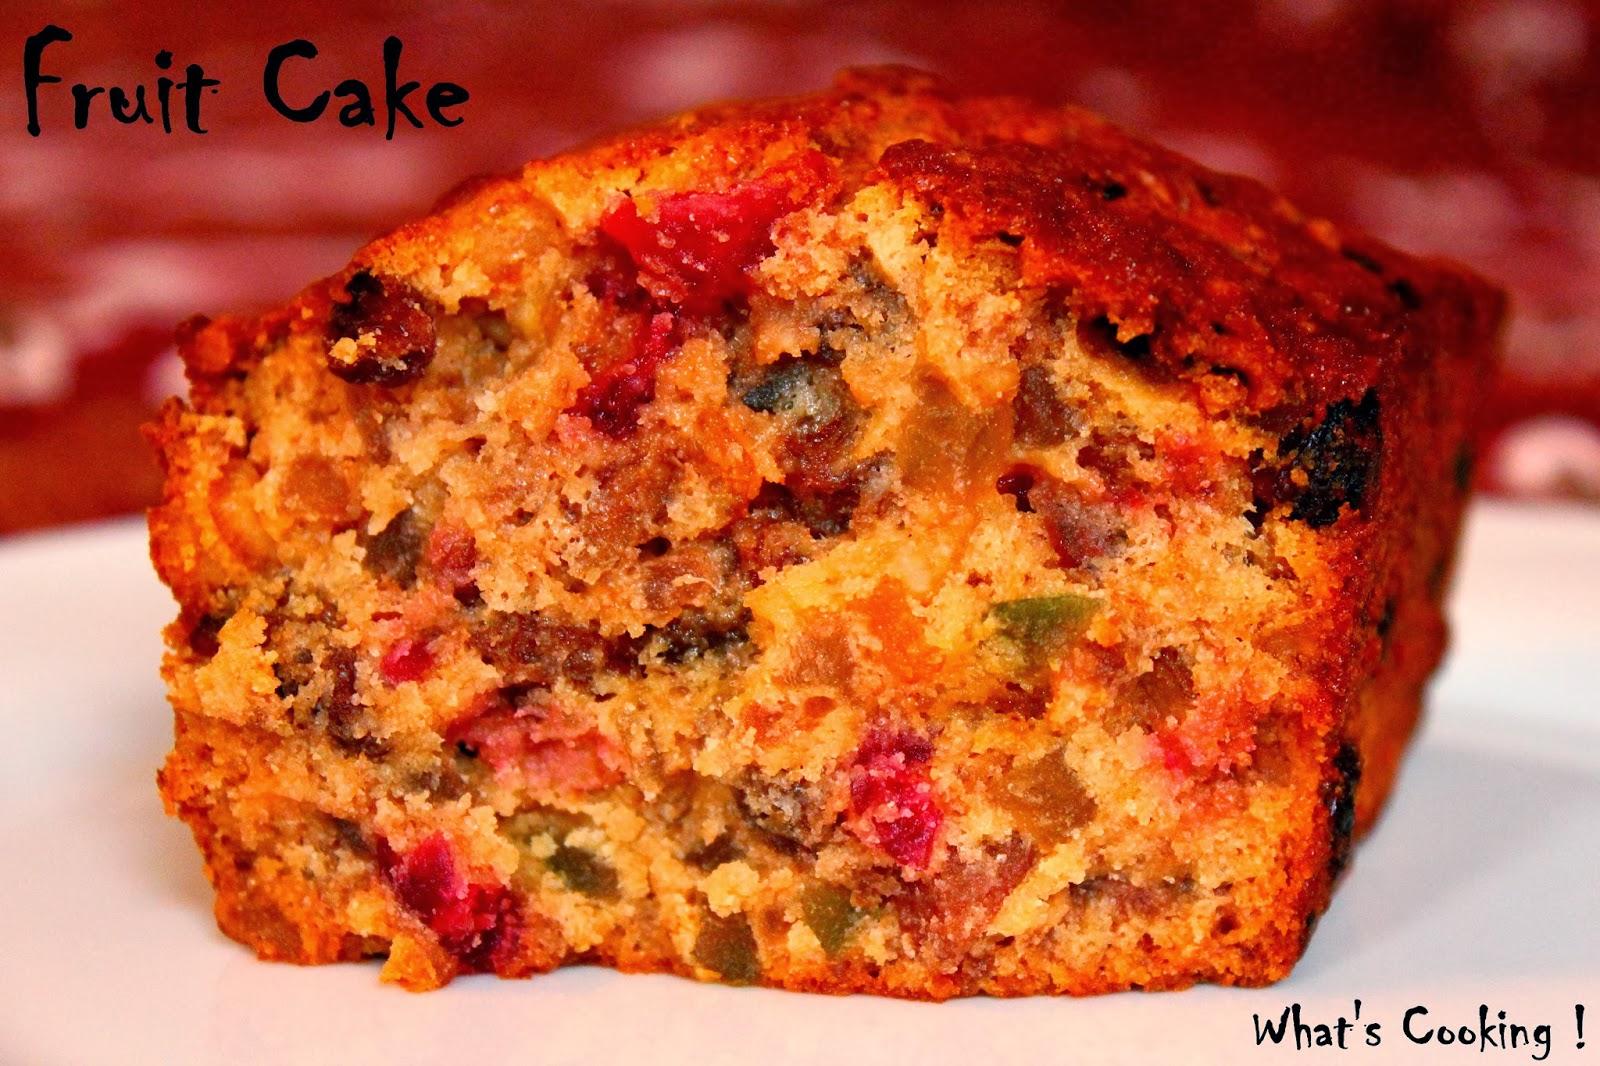 Spoiled Fruit Cake Recipe